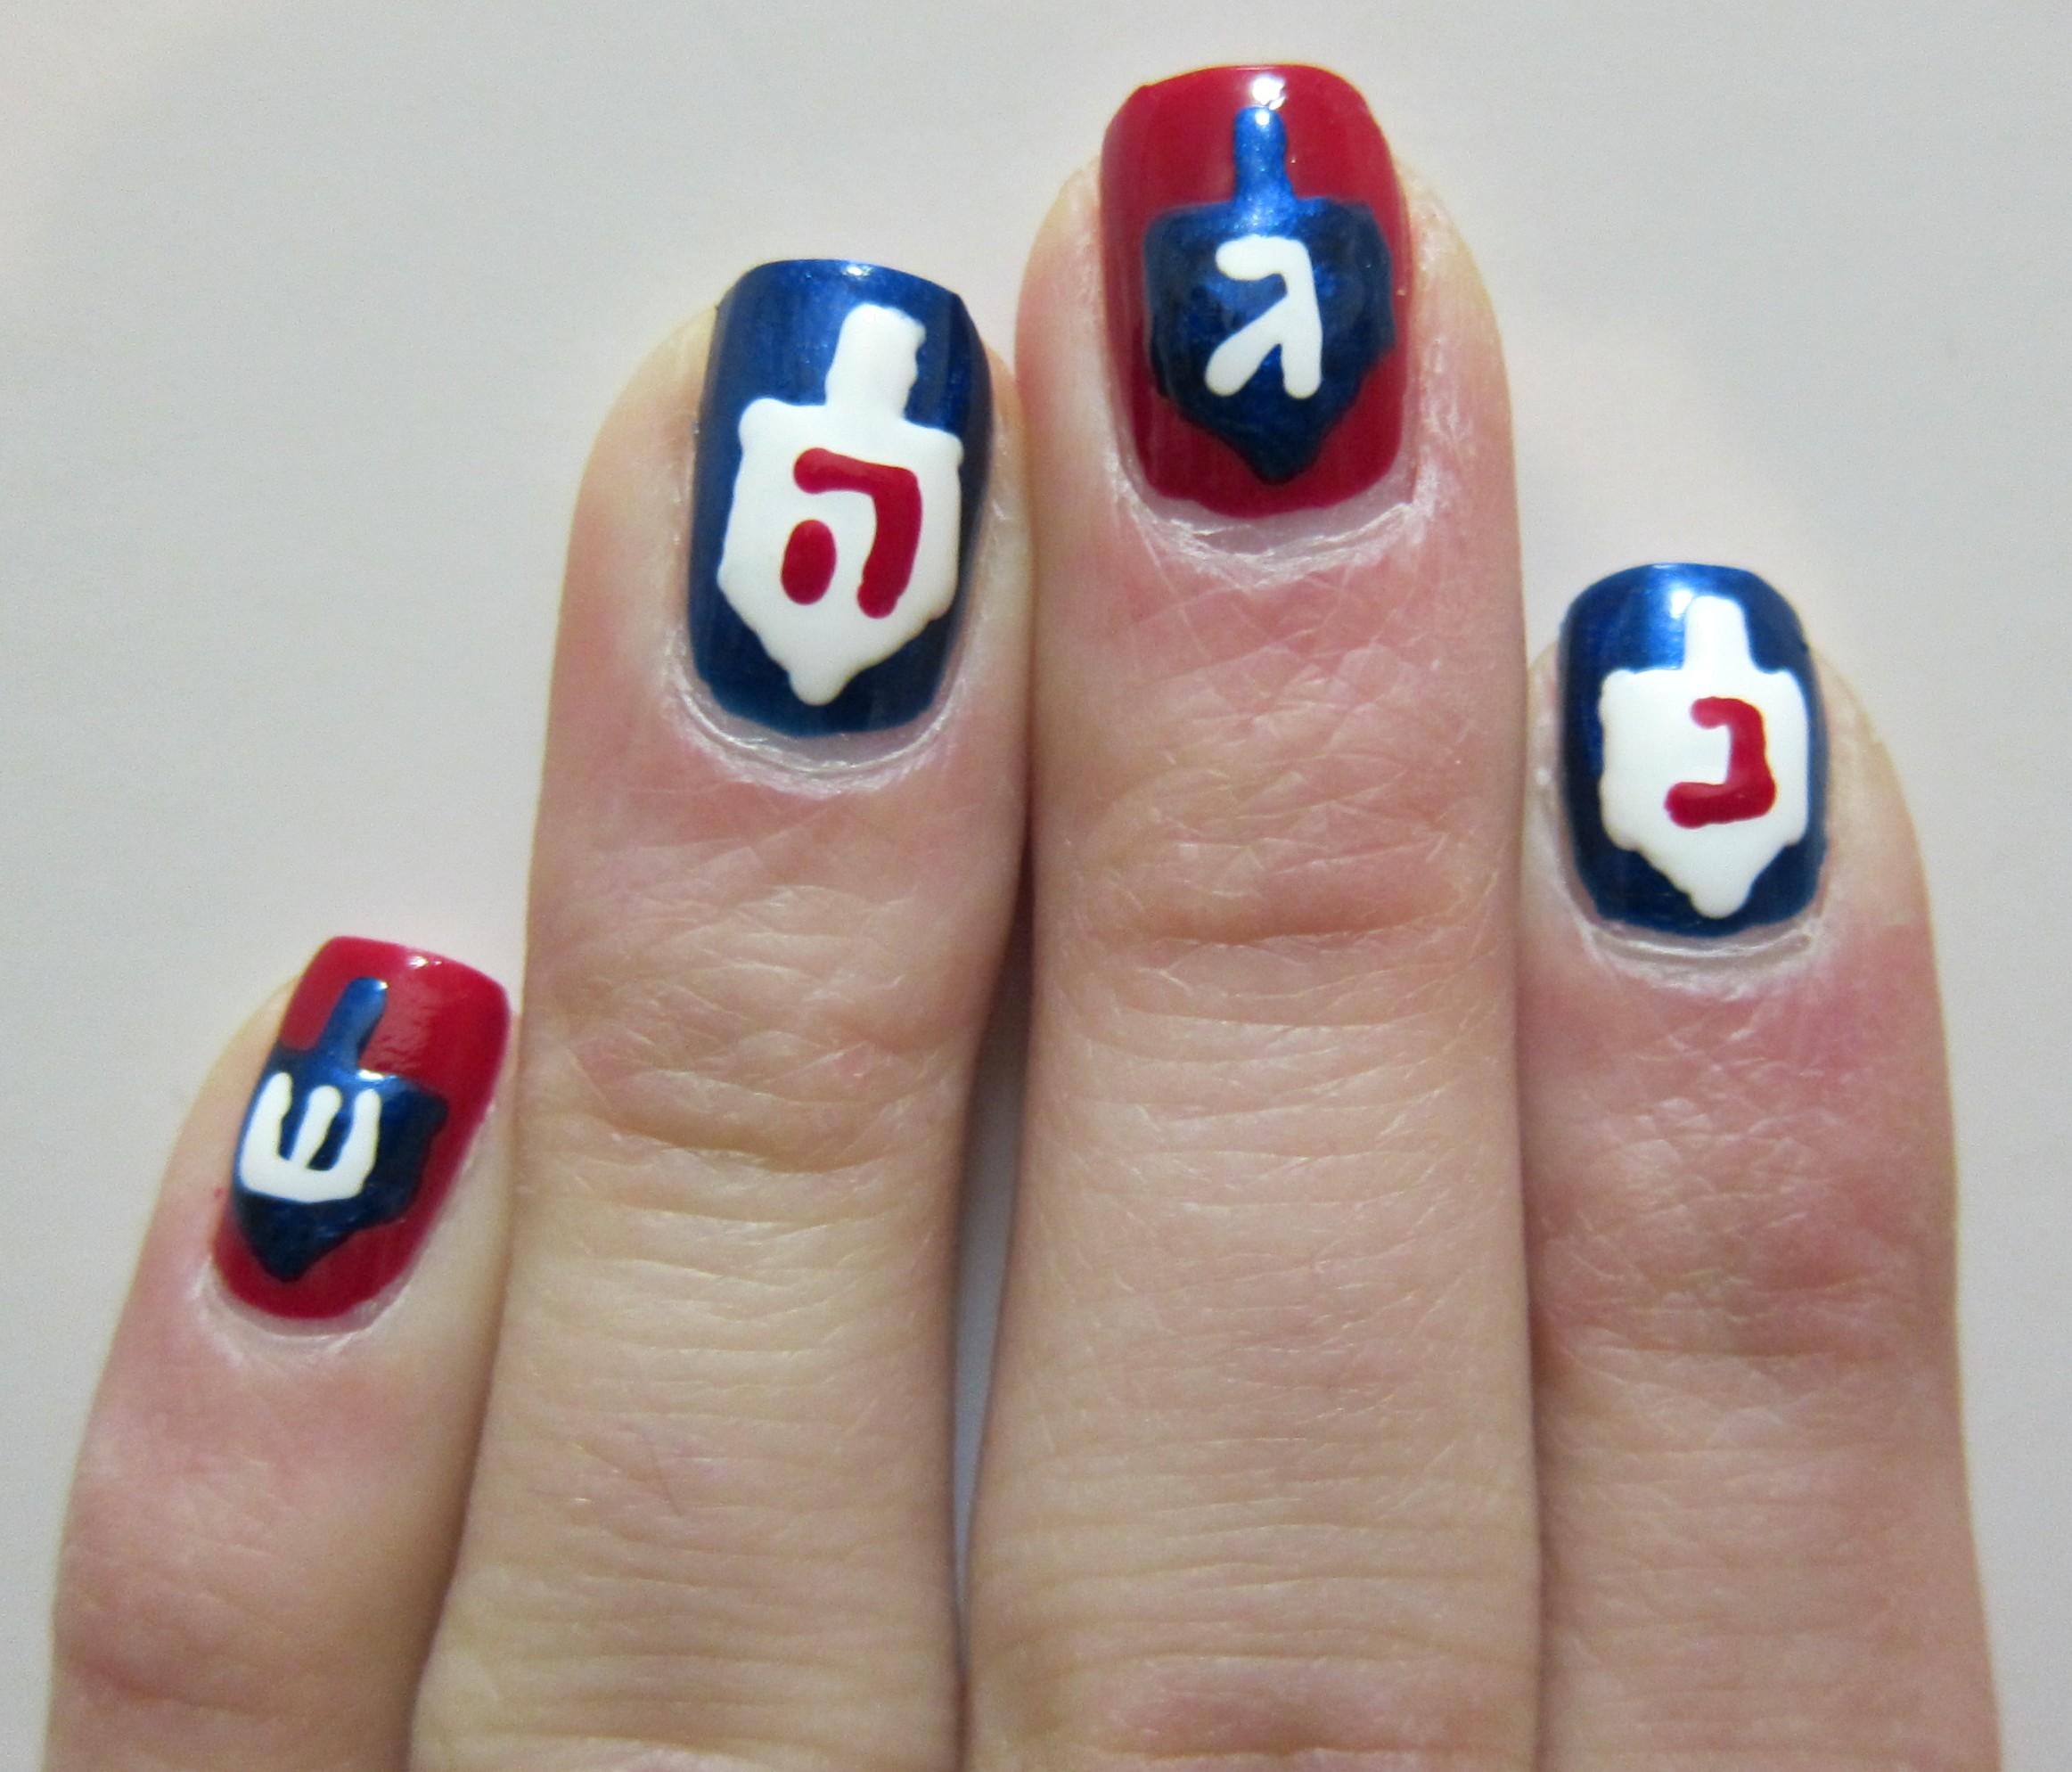 Hanukkah Holiday Nail Art Midrash Manicures